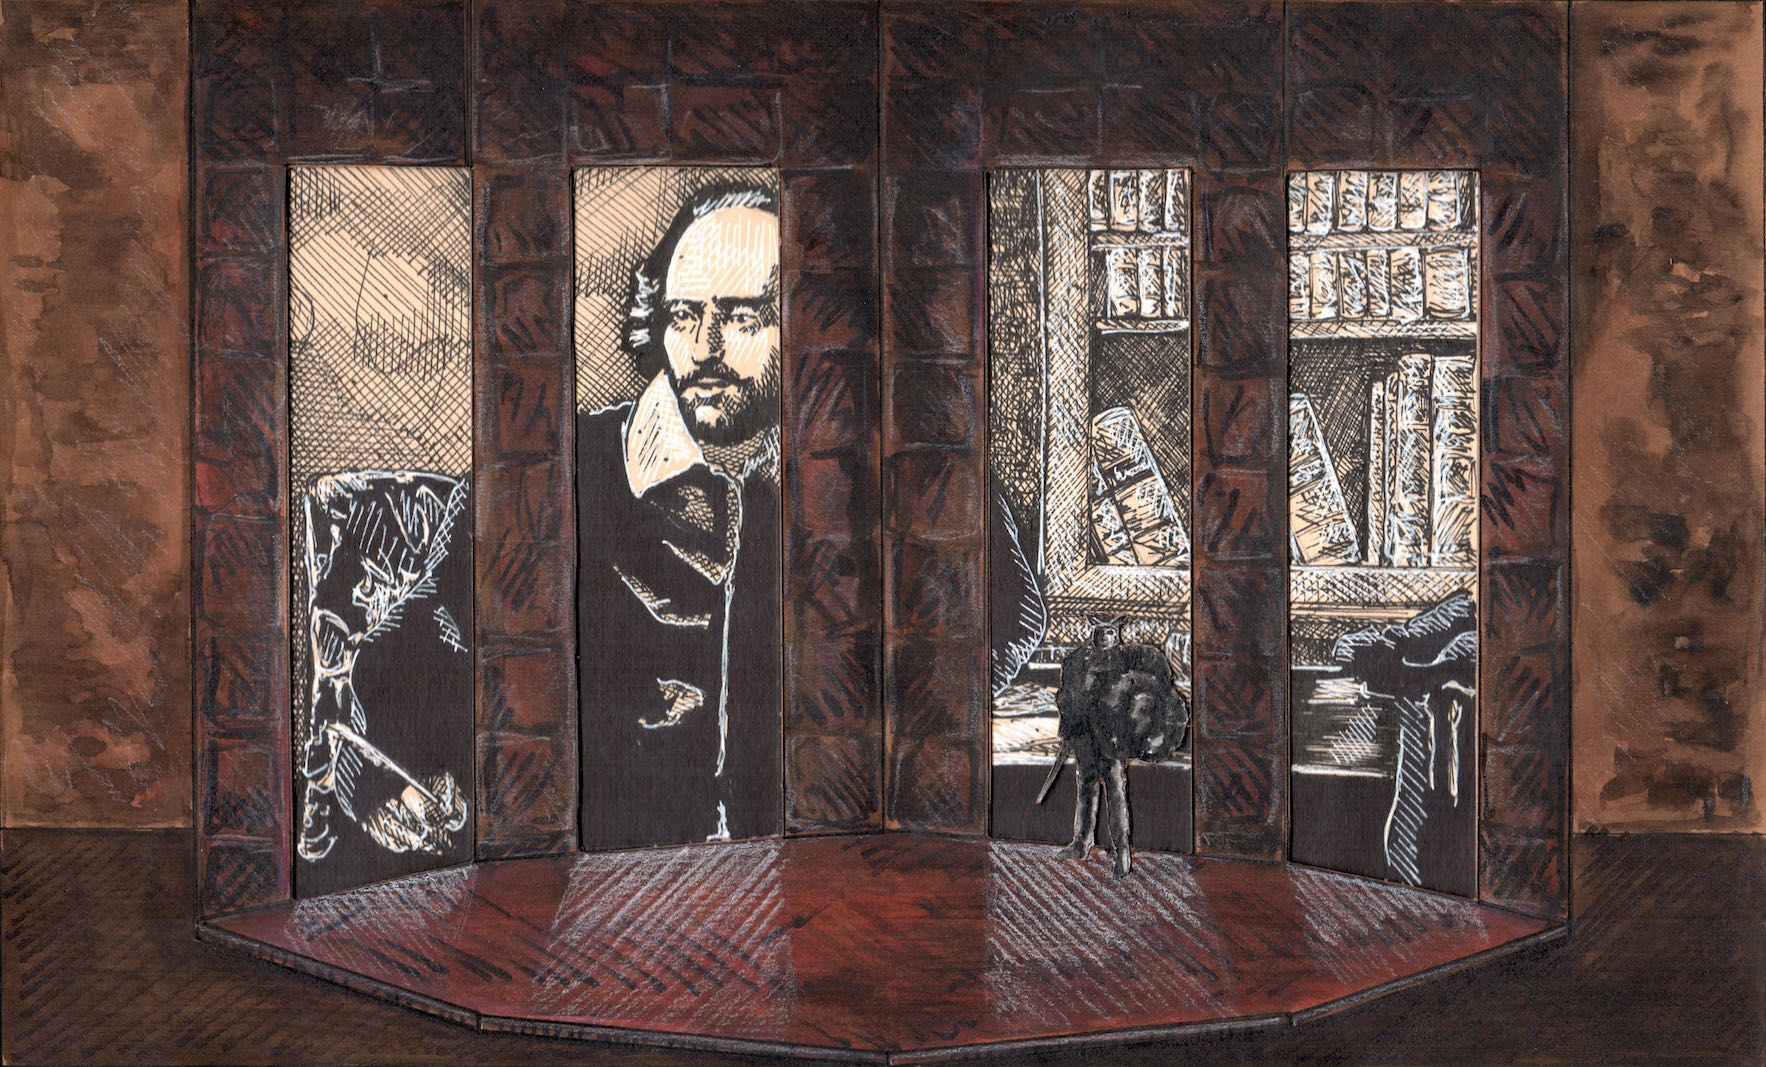 Shakespeare reimagined